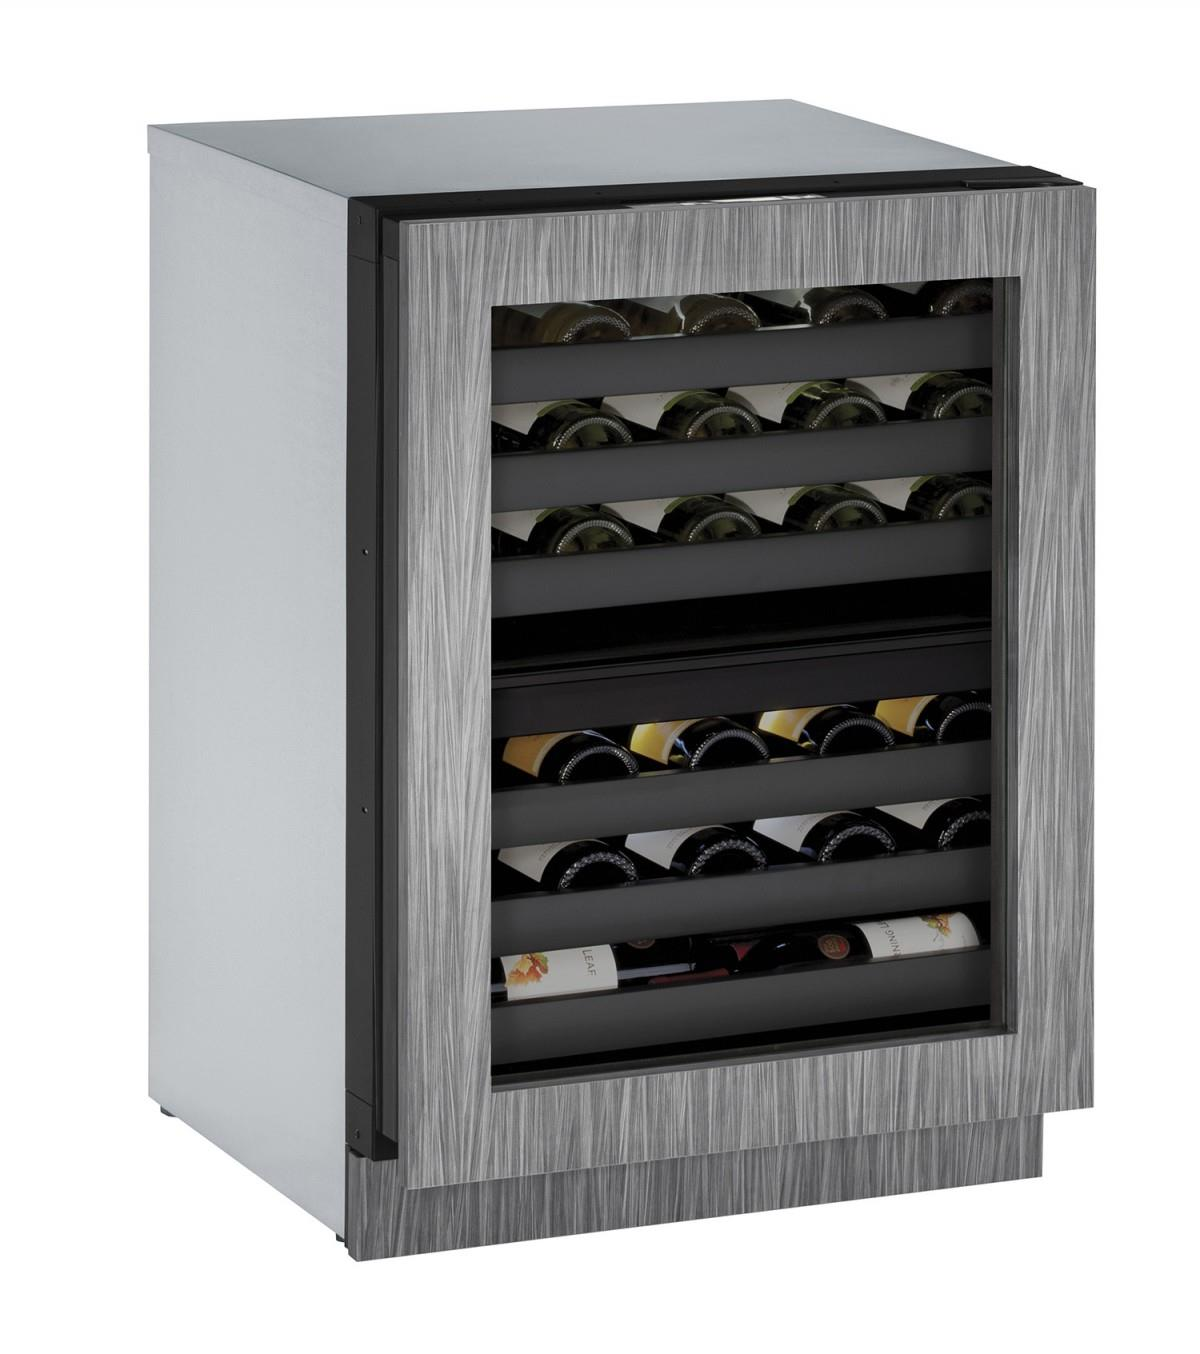 "U-Line Wine Captains 4.7 Cu. Ft. 24"" Built-In Wine Storage - Item Number: U-3024ZWCINT-00A"